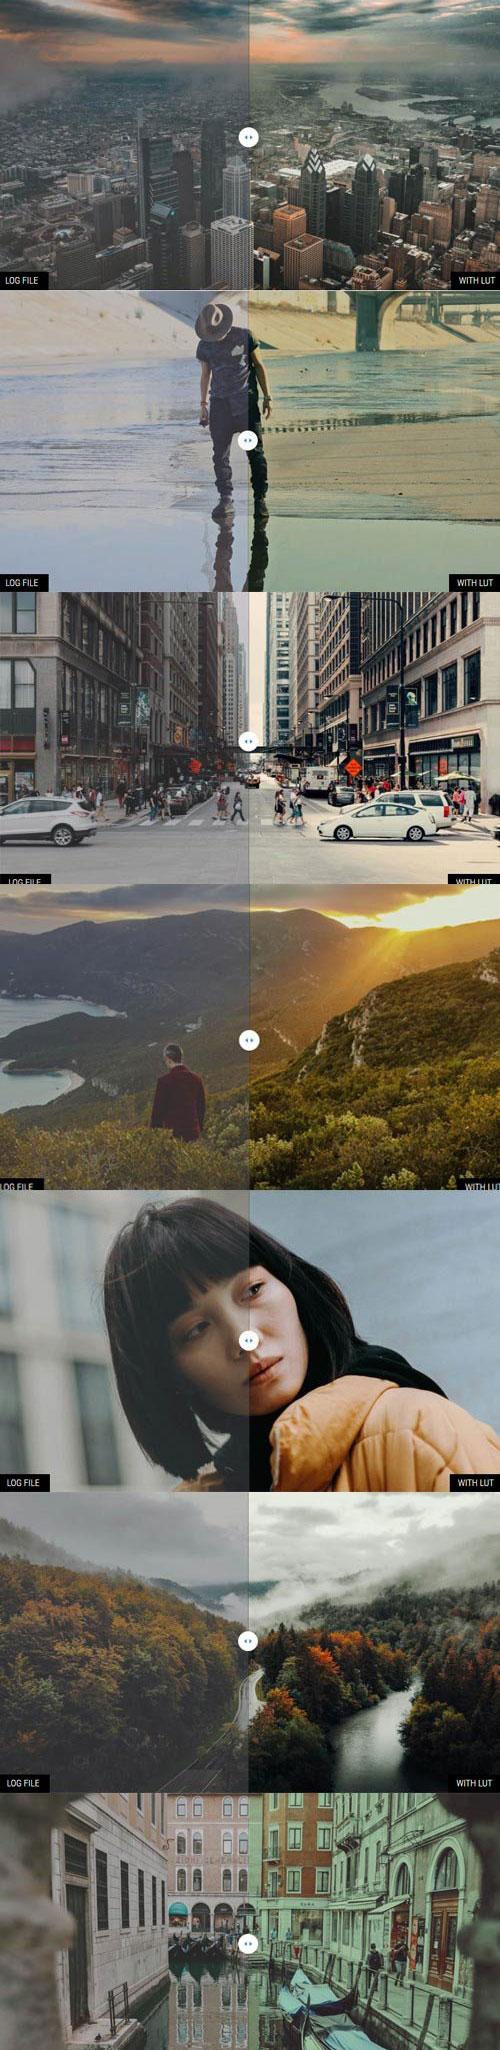 MotionVFX mLUT Film 3 Free Download